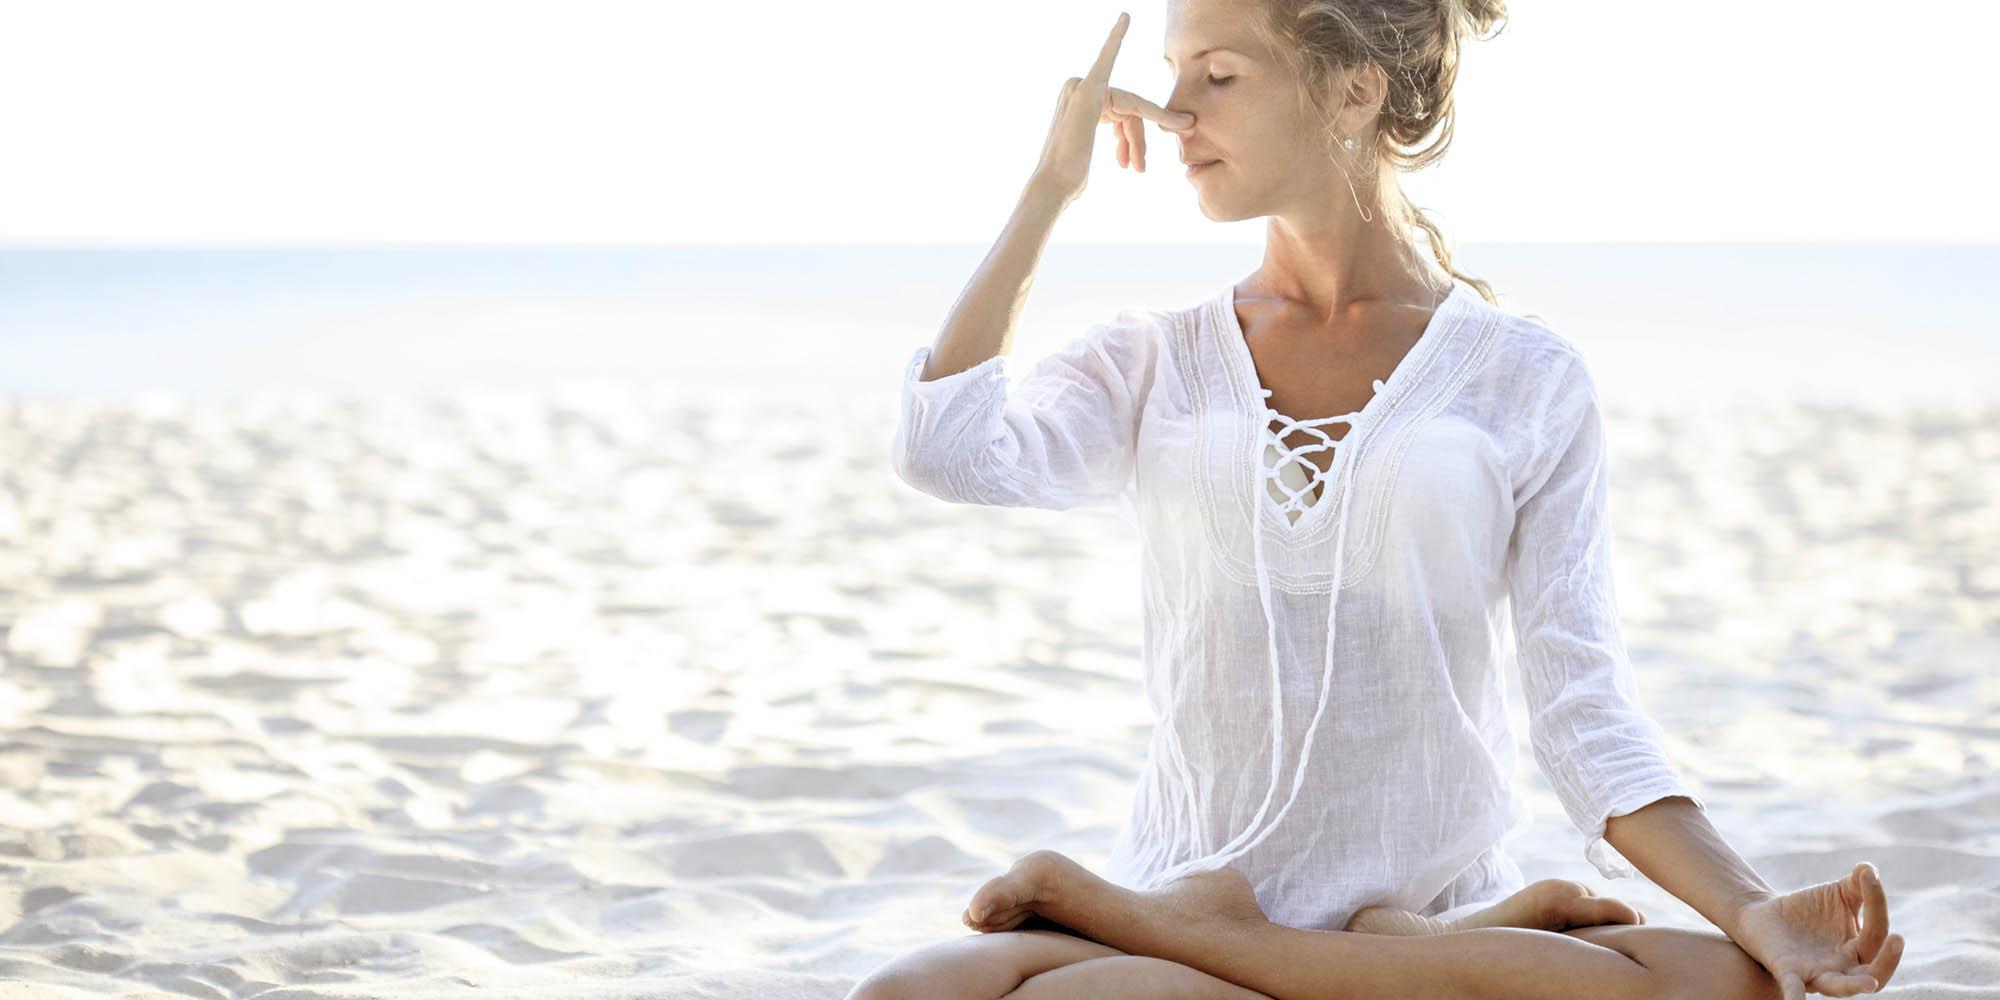 How Can Pranayama Reduce Stress?